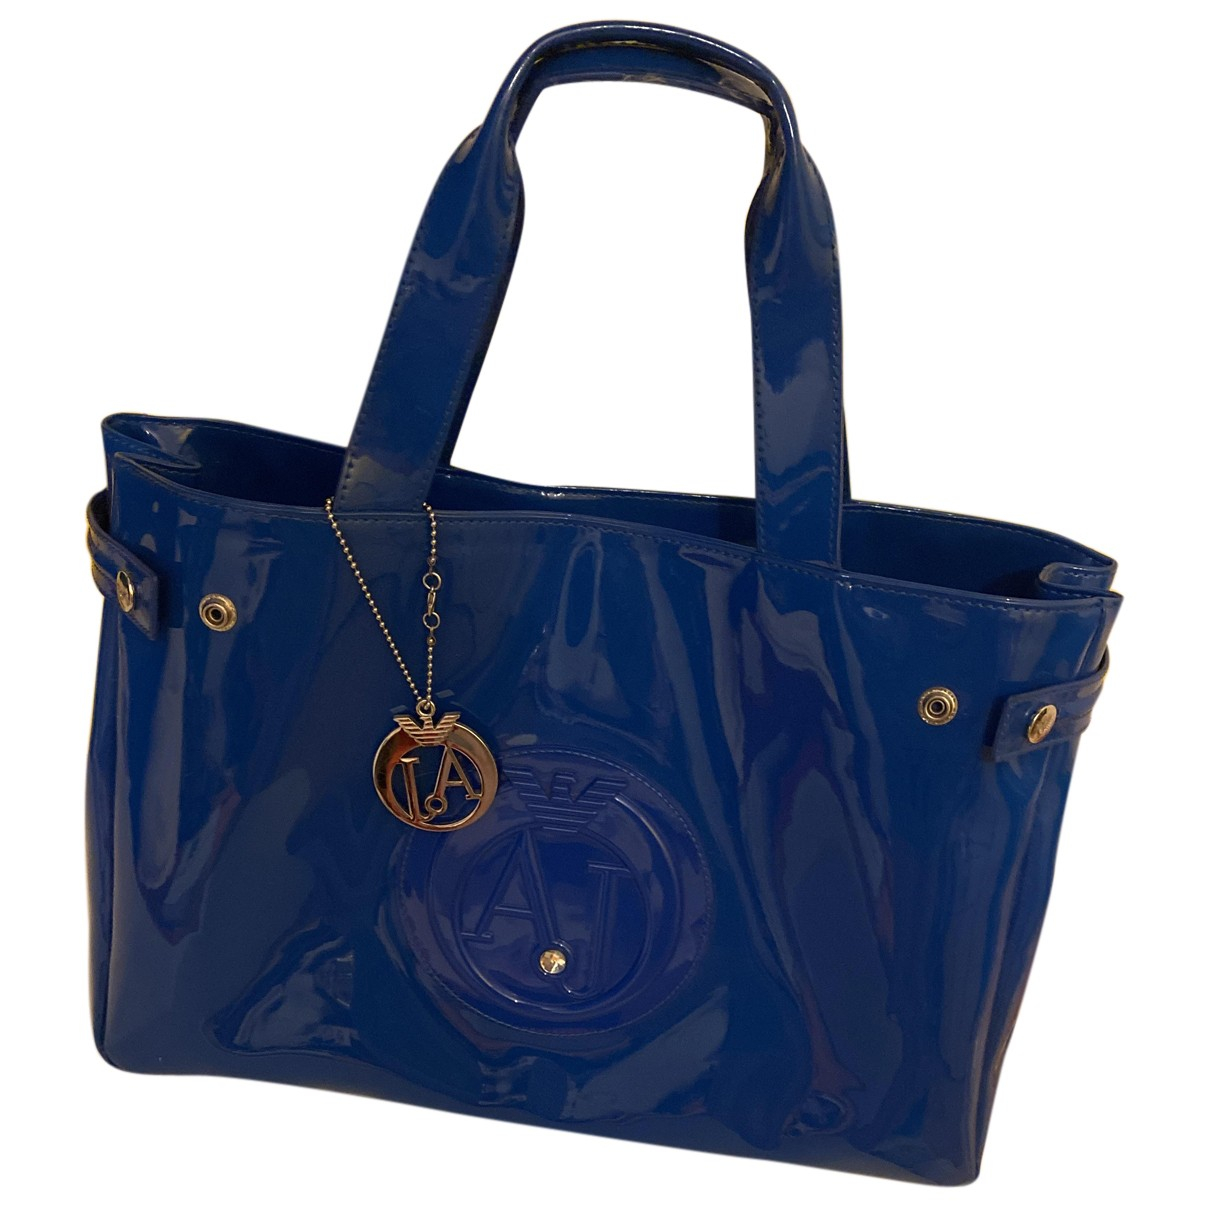 Armani Jeans \N Handtasche in  Blau Lackleder